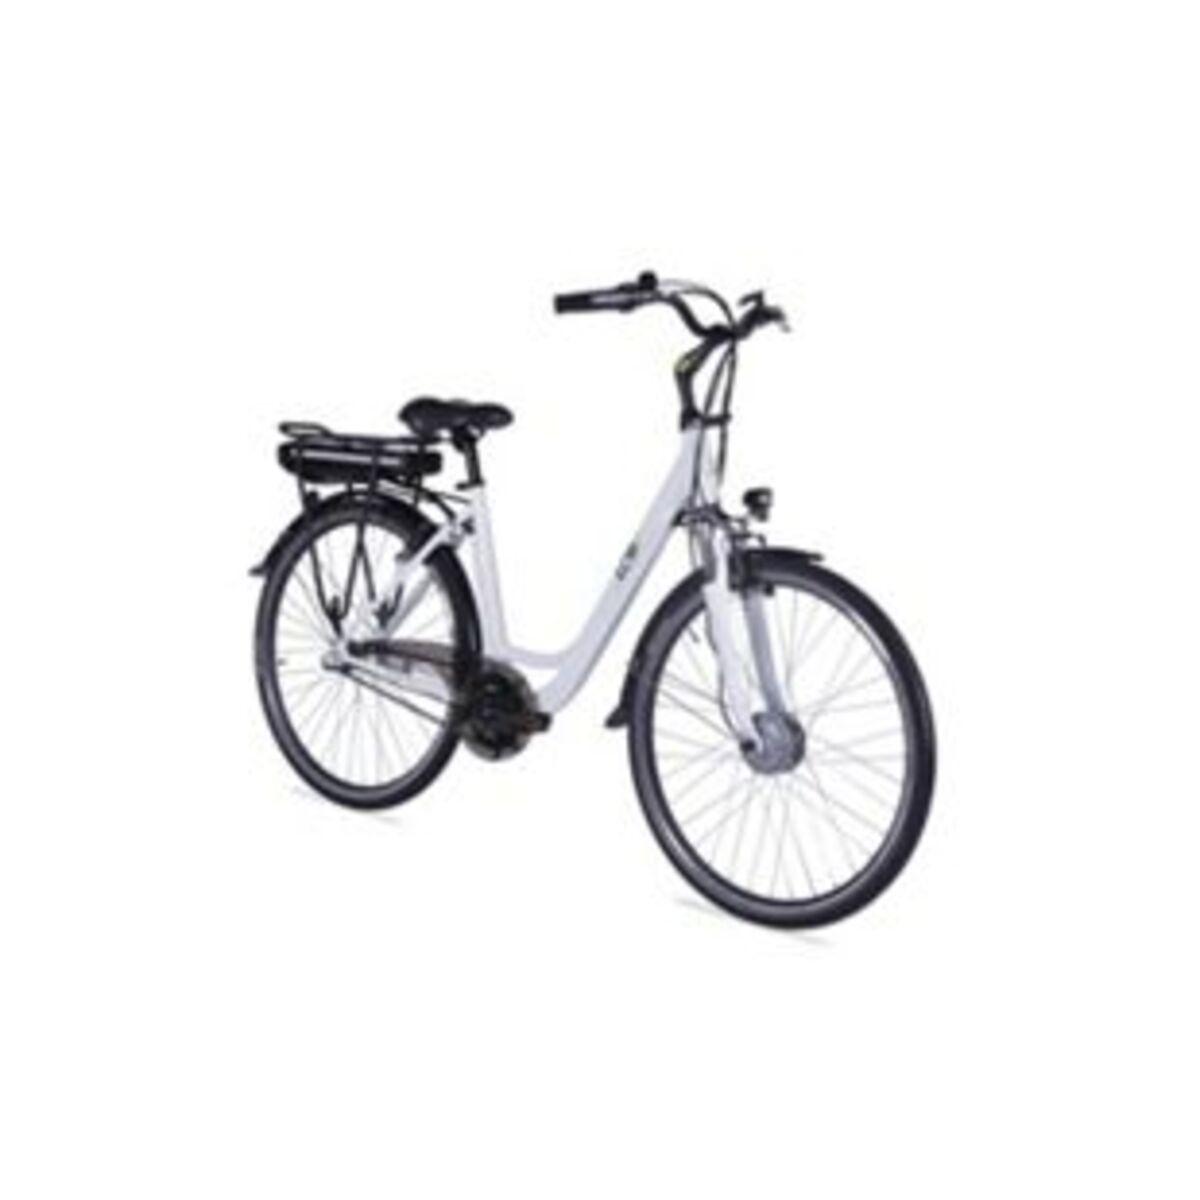 Bild 2 von Llobe Metropolitan Joy City E-Bike weiß 36V/8Ah